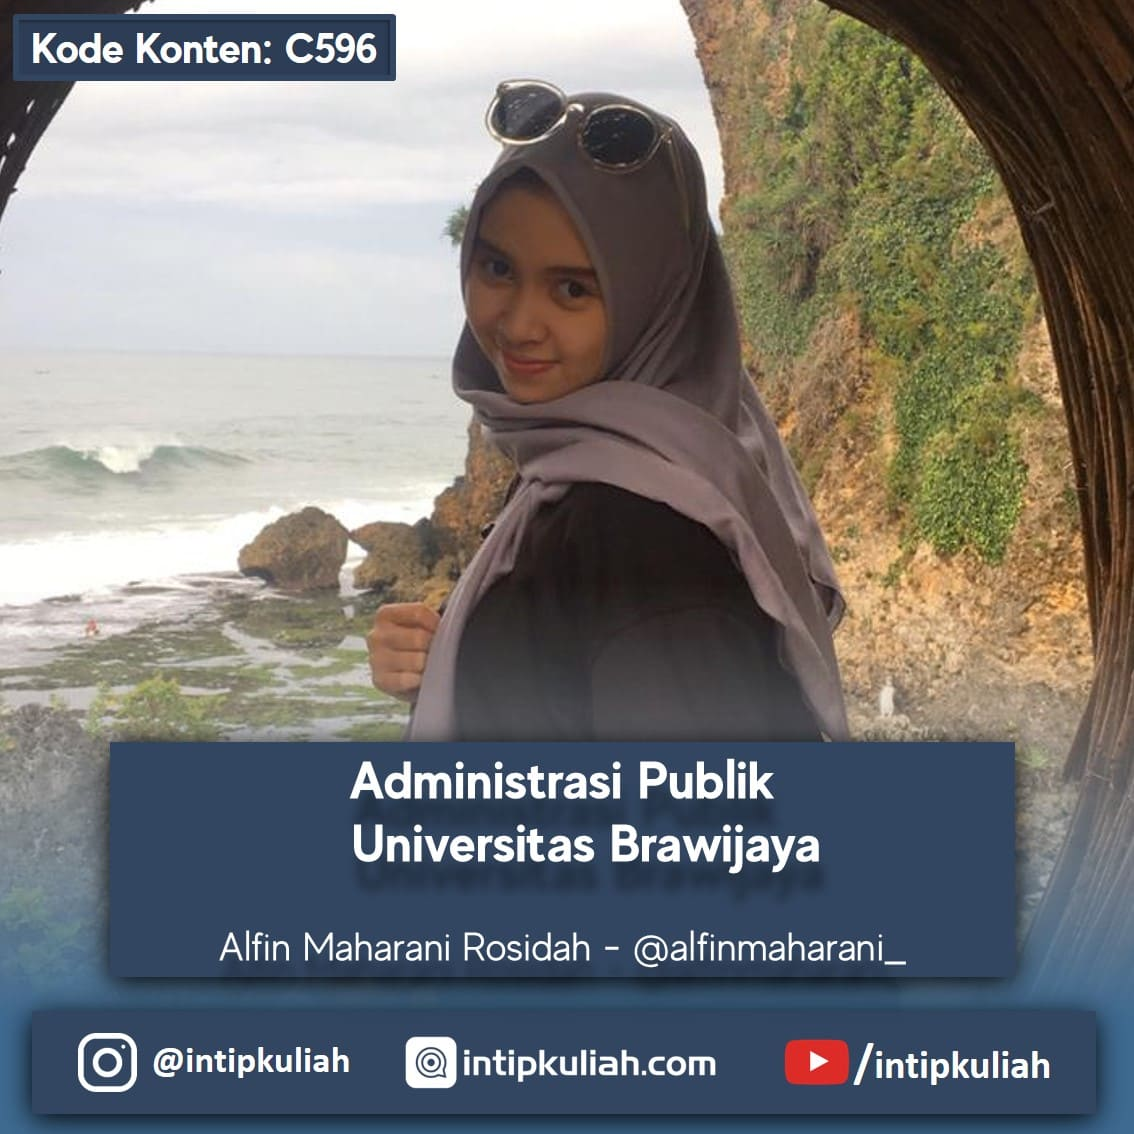 Ilmu Administrasi Publik Universitas Brawijaya (Alfin)